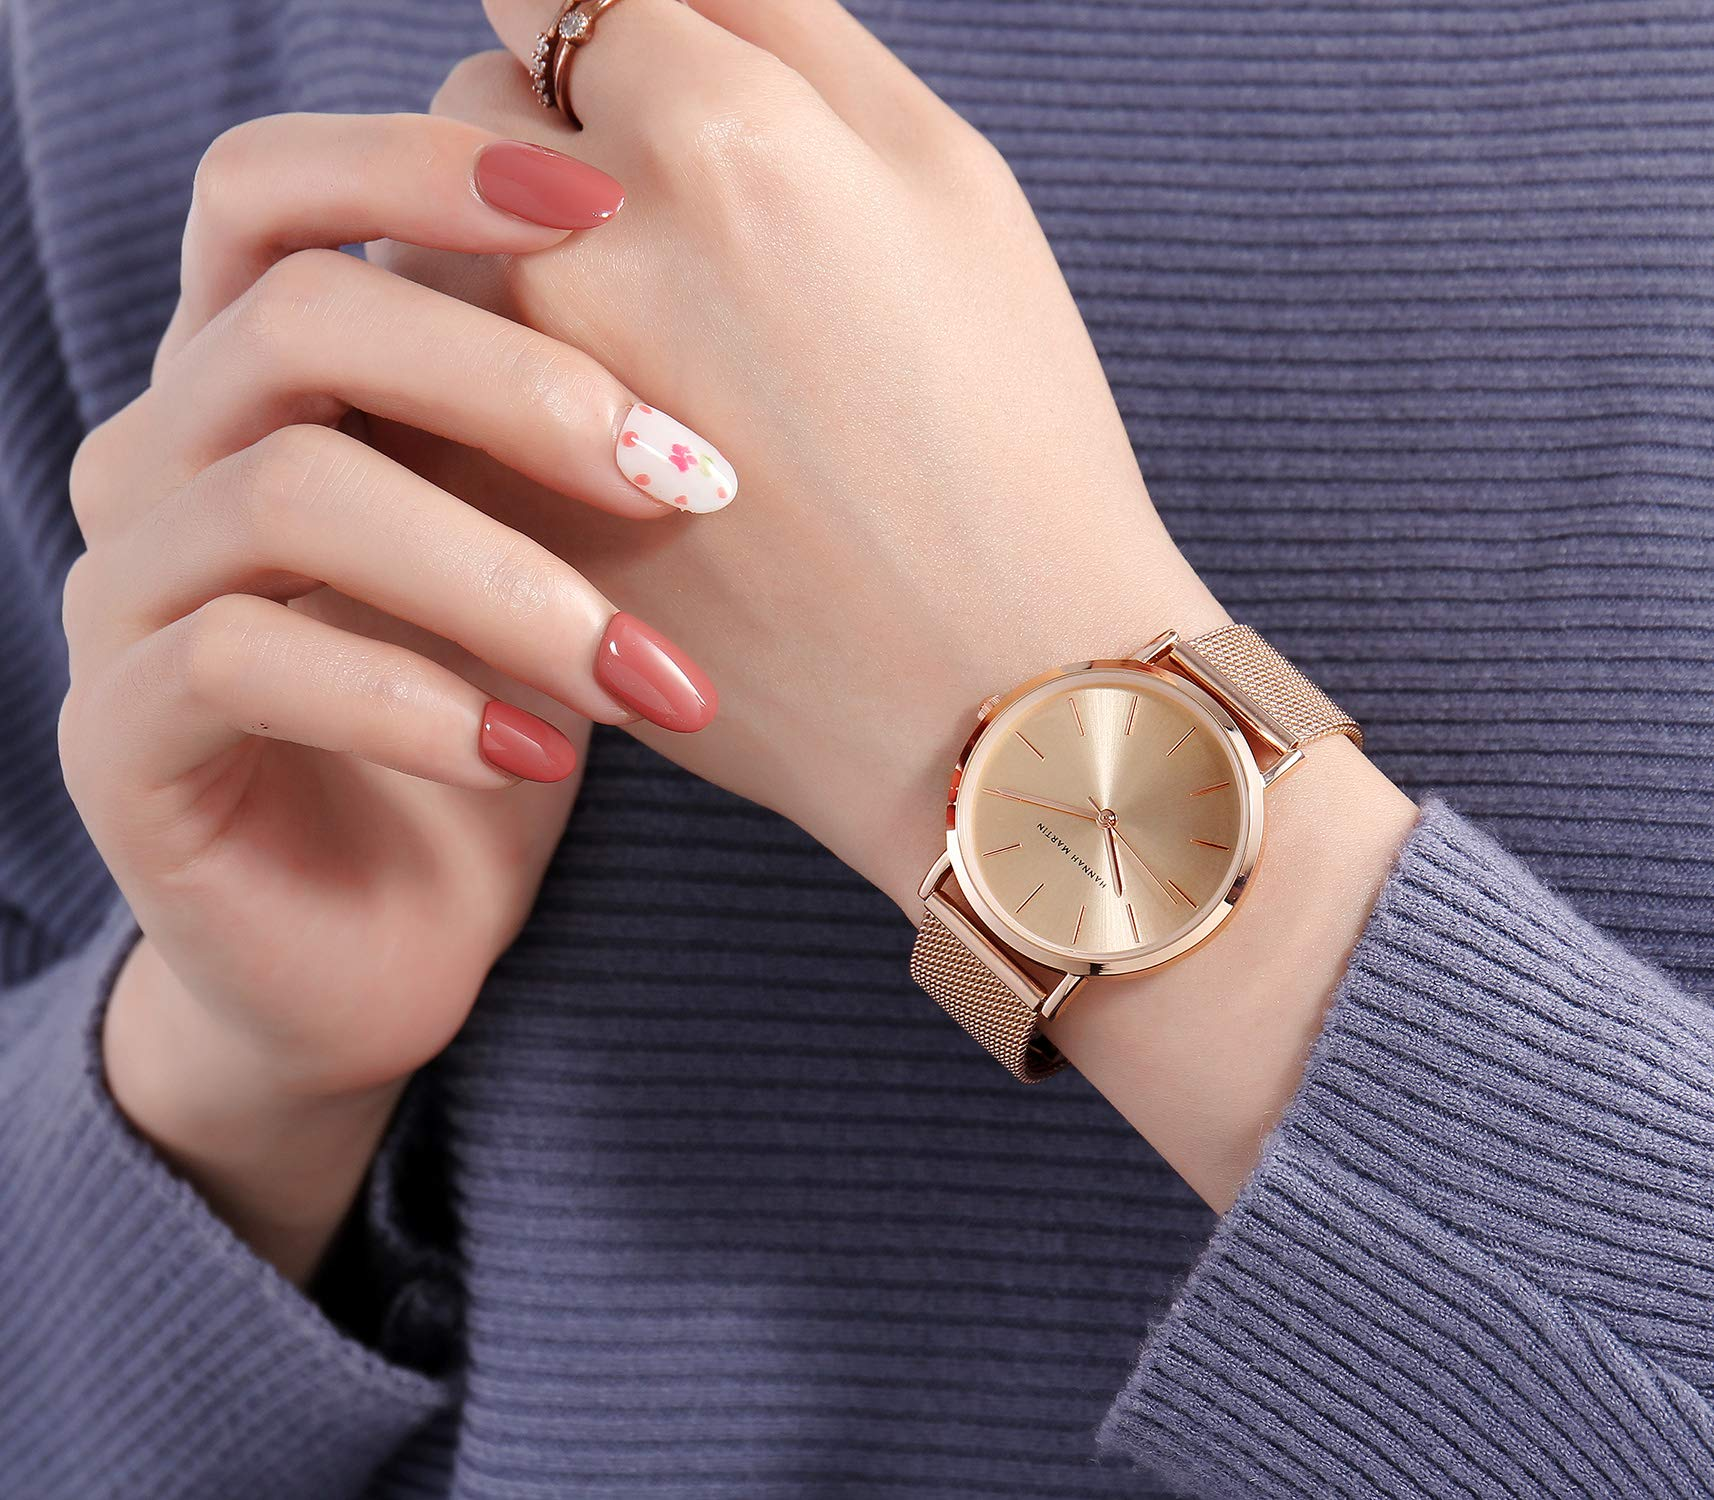 Kubagom-Damen-Uhren-Analog-Quarz-Edelstahl-Wasserdicht-Mesh-Ultradnne-Set-mit-Armreif